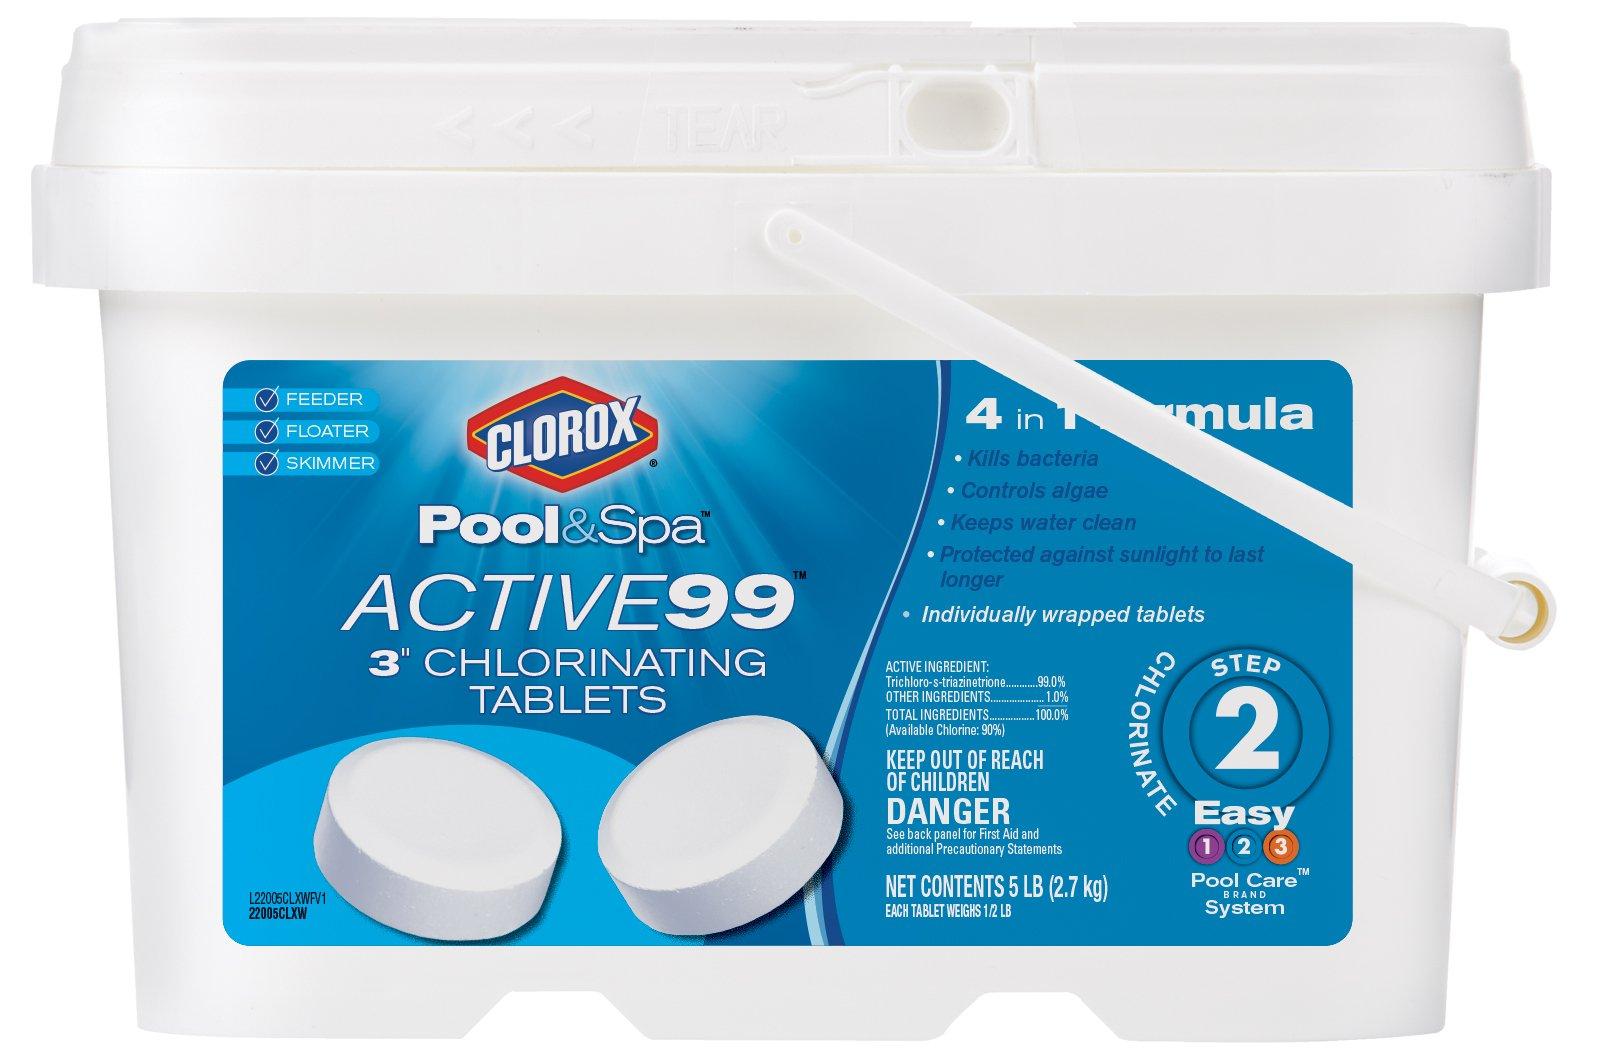 Clorox Pool&Spa Active99 3'' Chlorinating Tablets 5 lb by CLOROX Pool&Spa